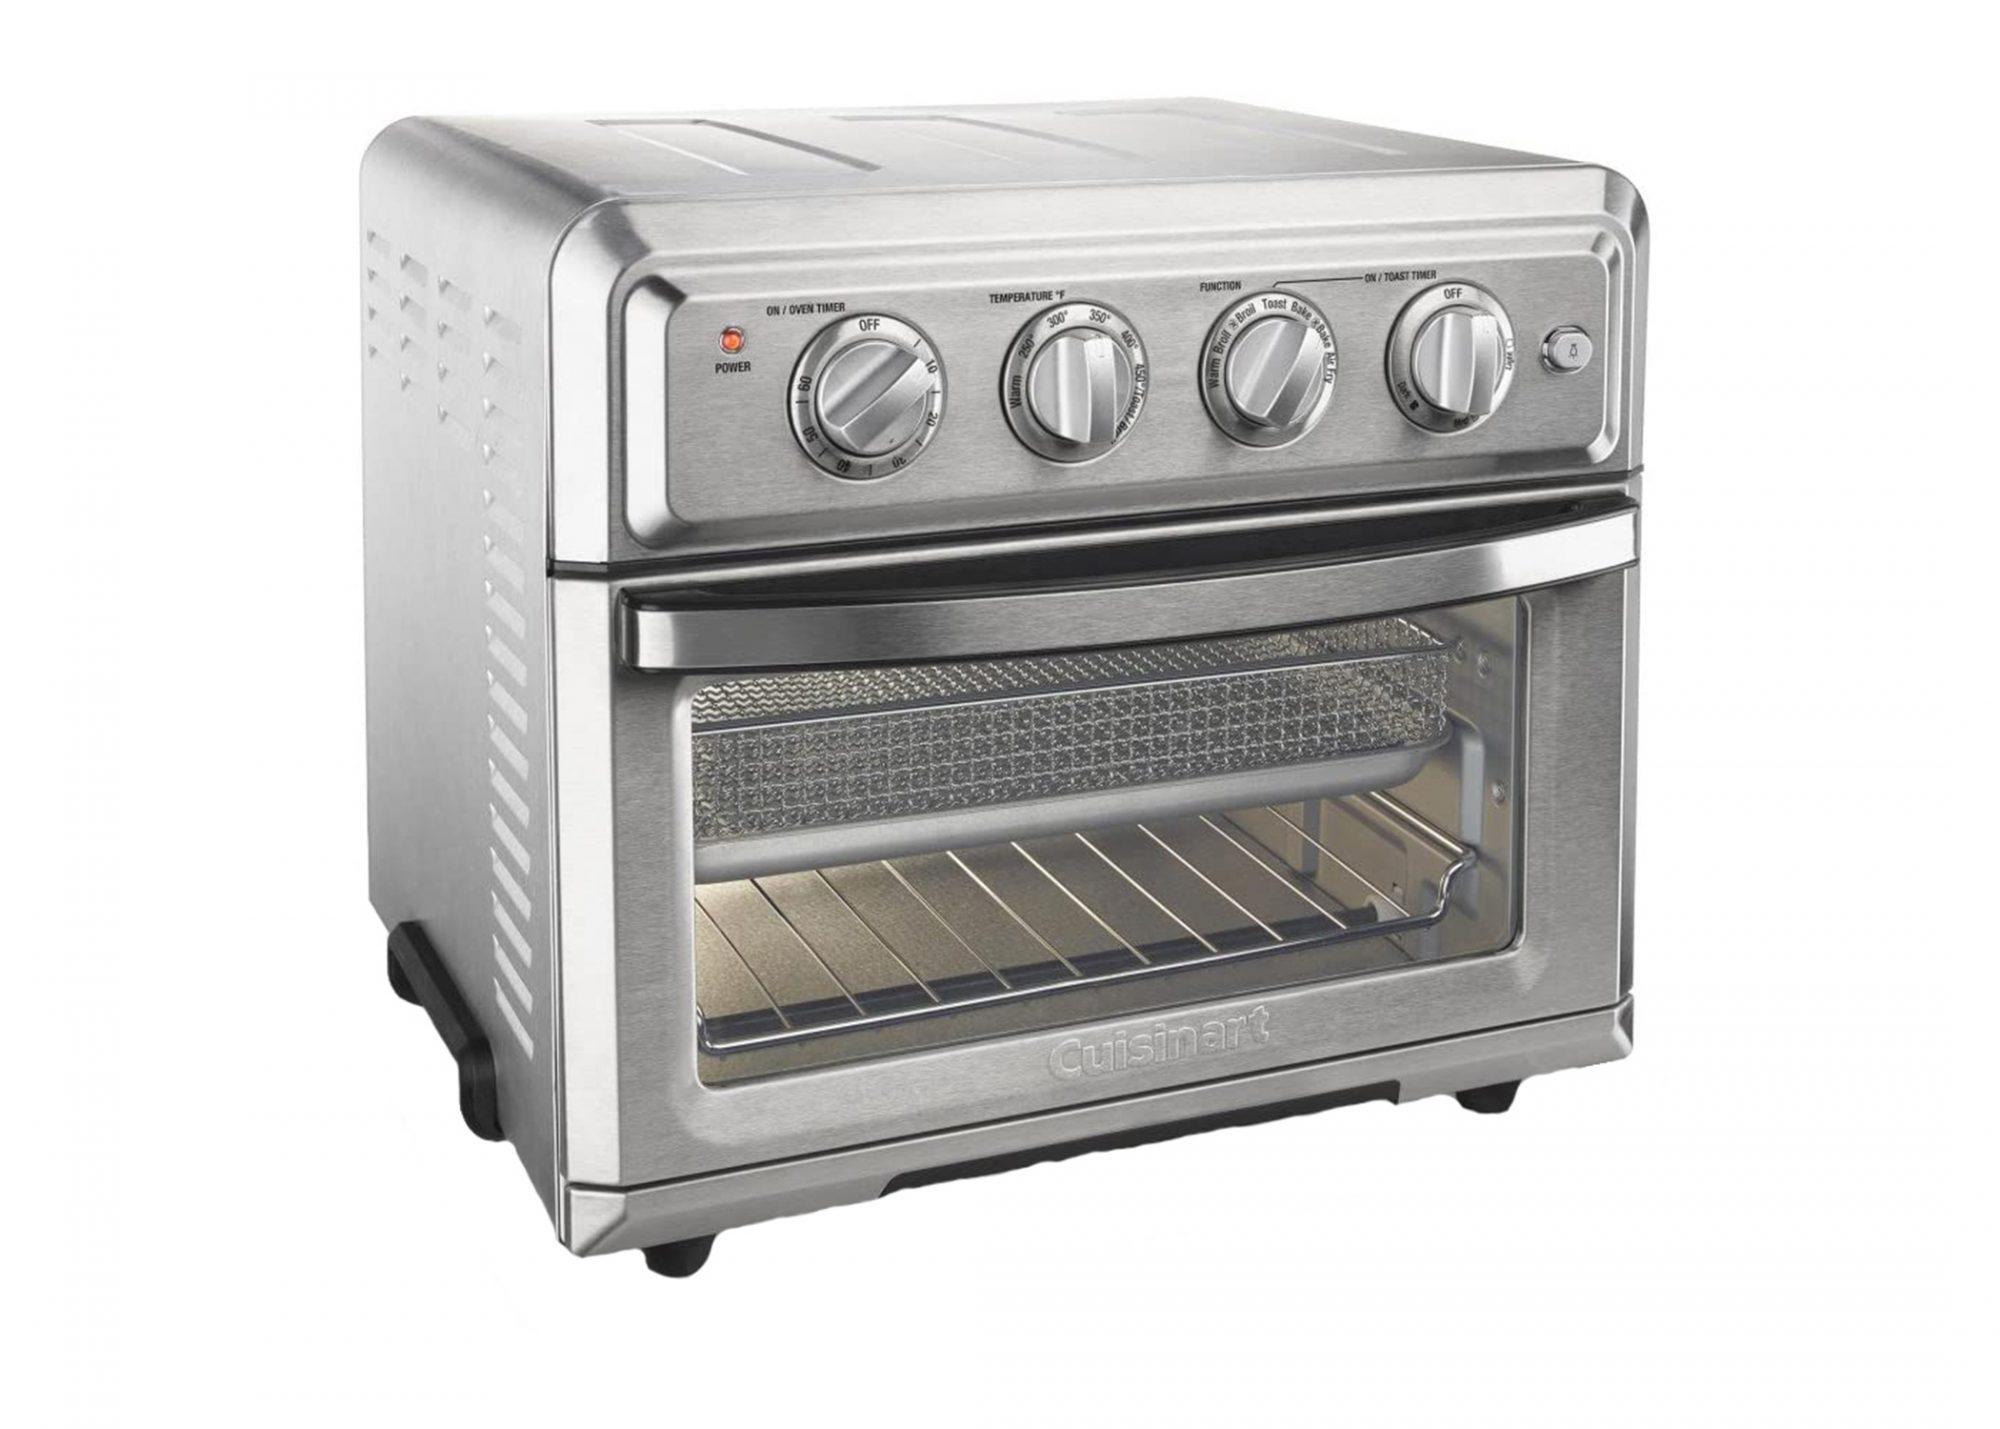 prime-day-toaster-3-NEW.jpg